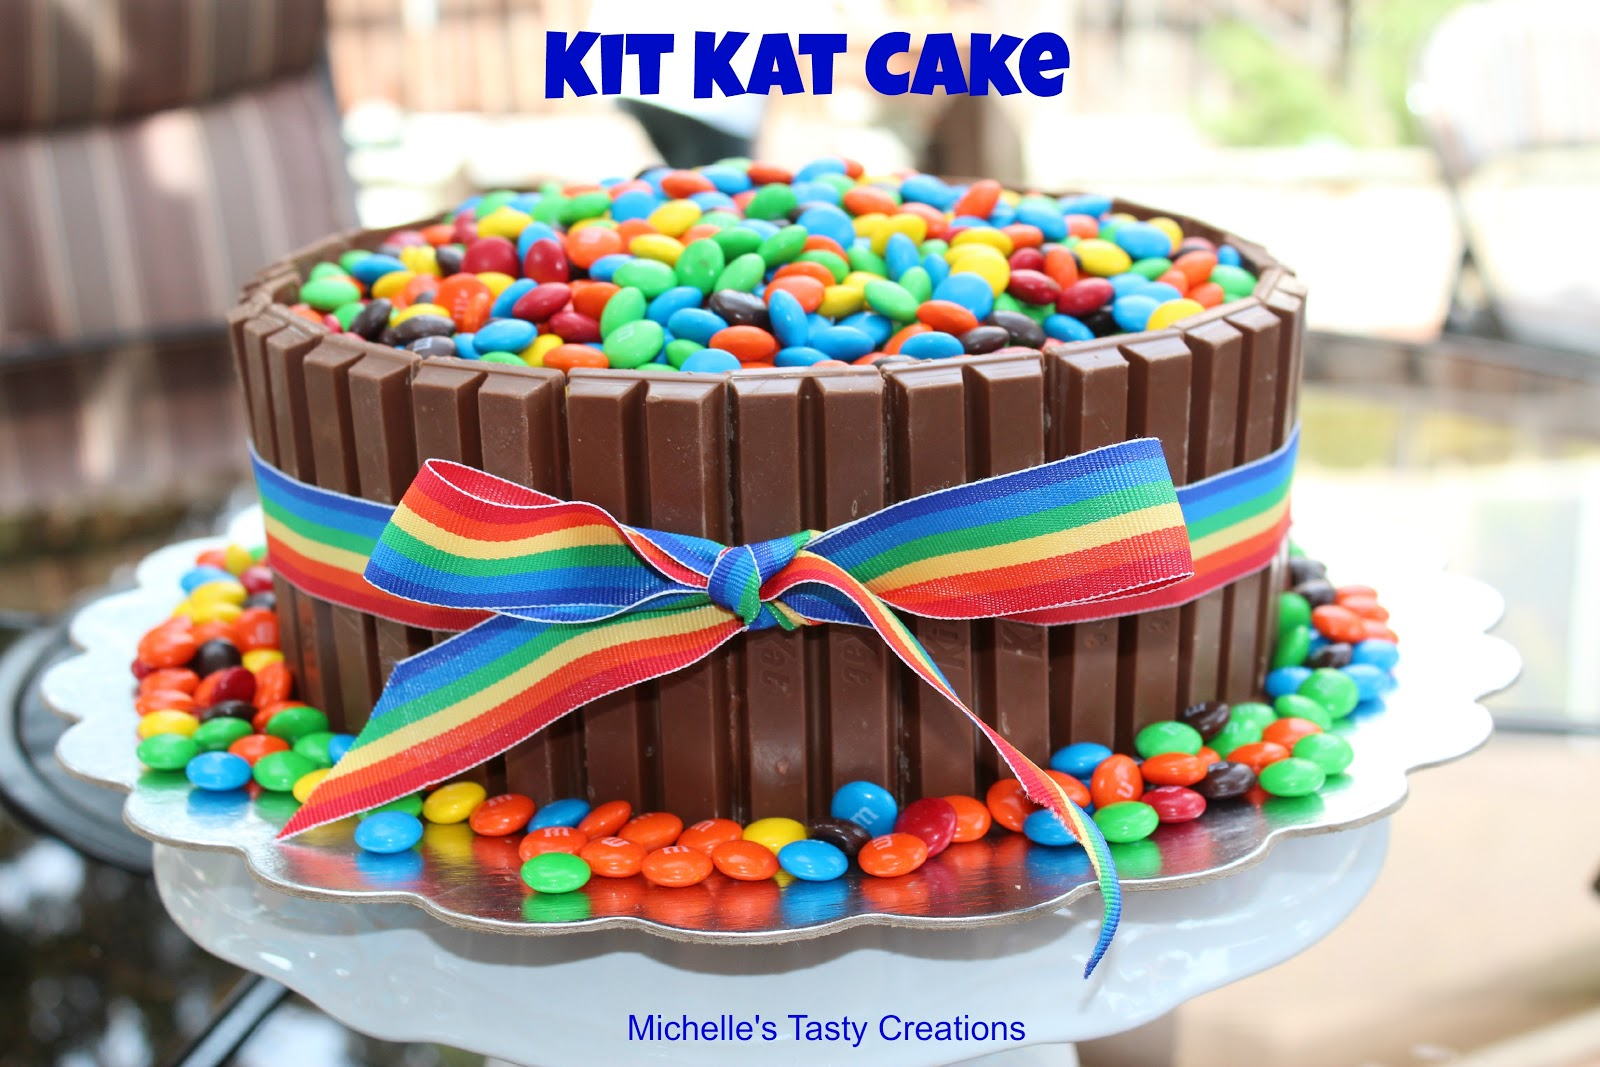 Where Can I Buy A Kit Kat Cake